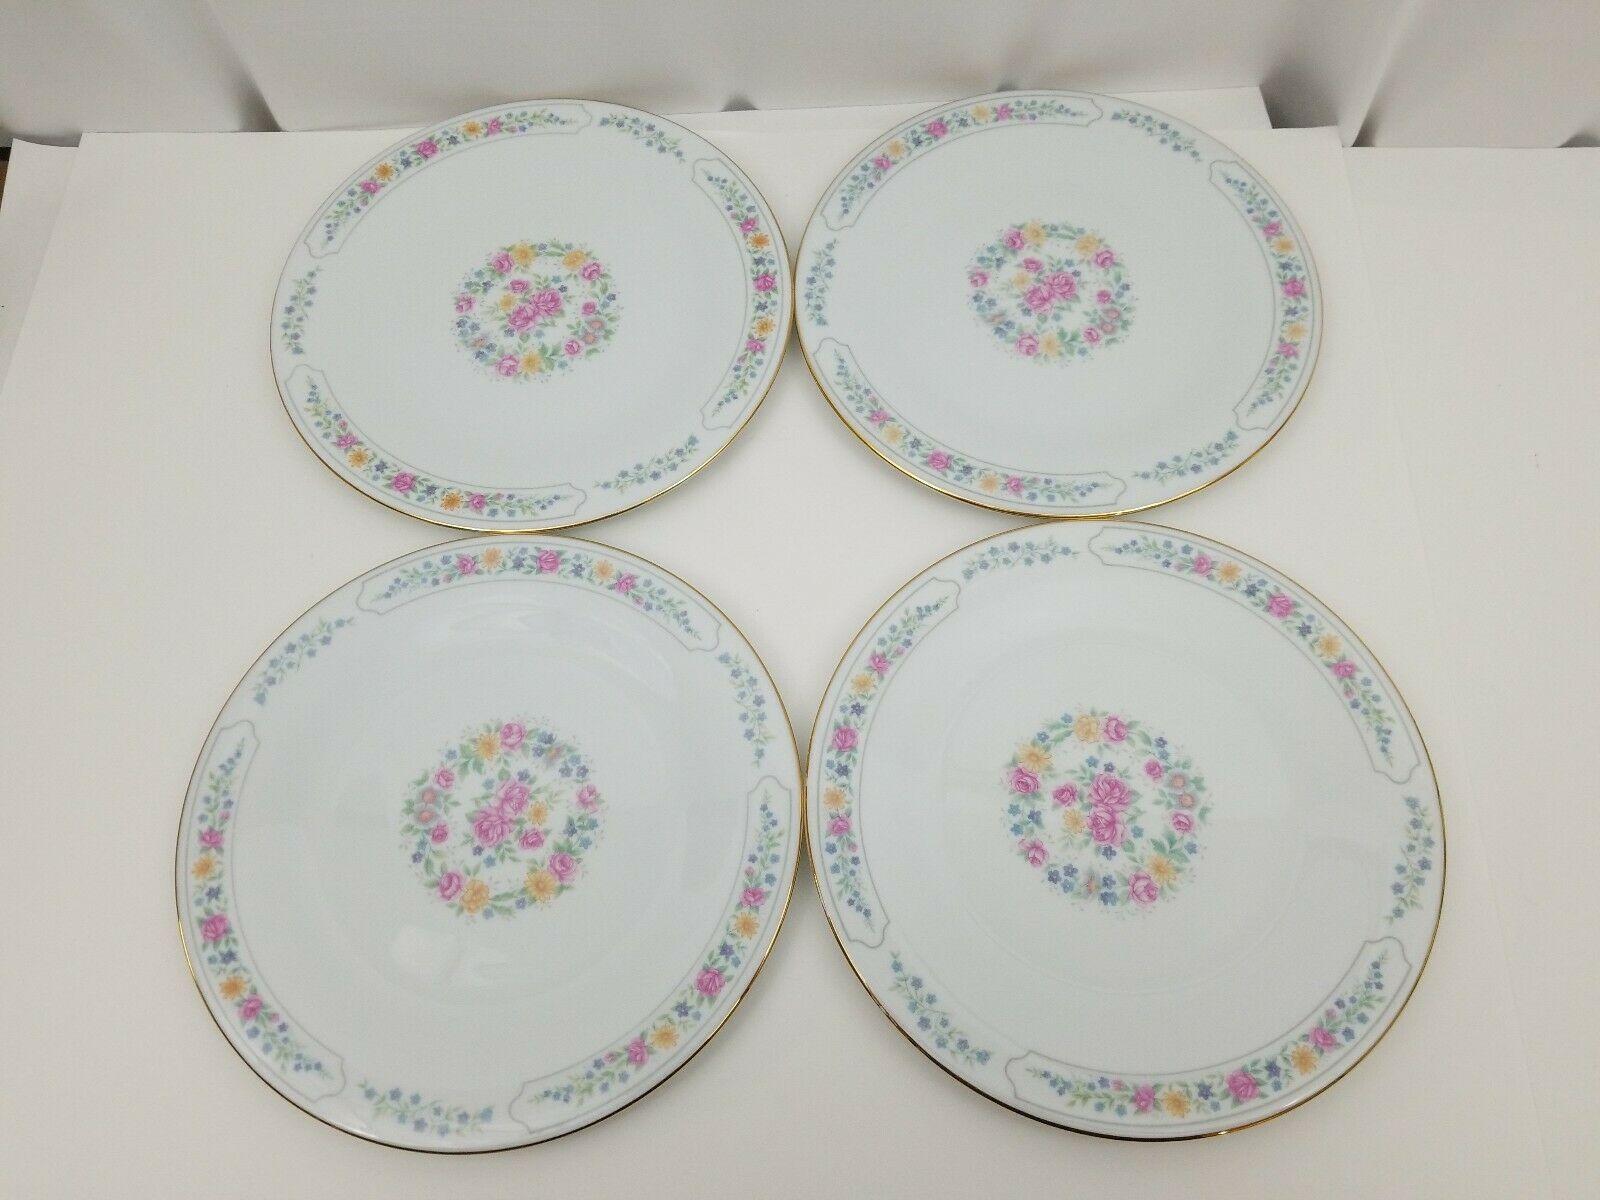 "Liling Fine China Dinner Plates Set of 4 Yung Shen White Roses Keepsake 10 5/8"""